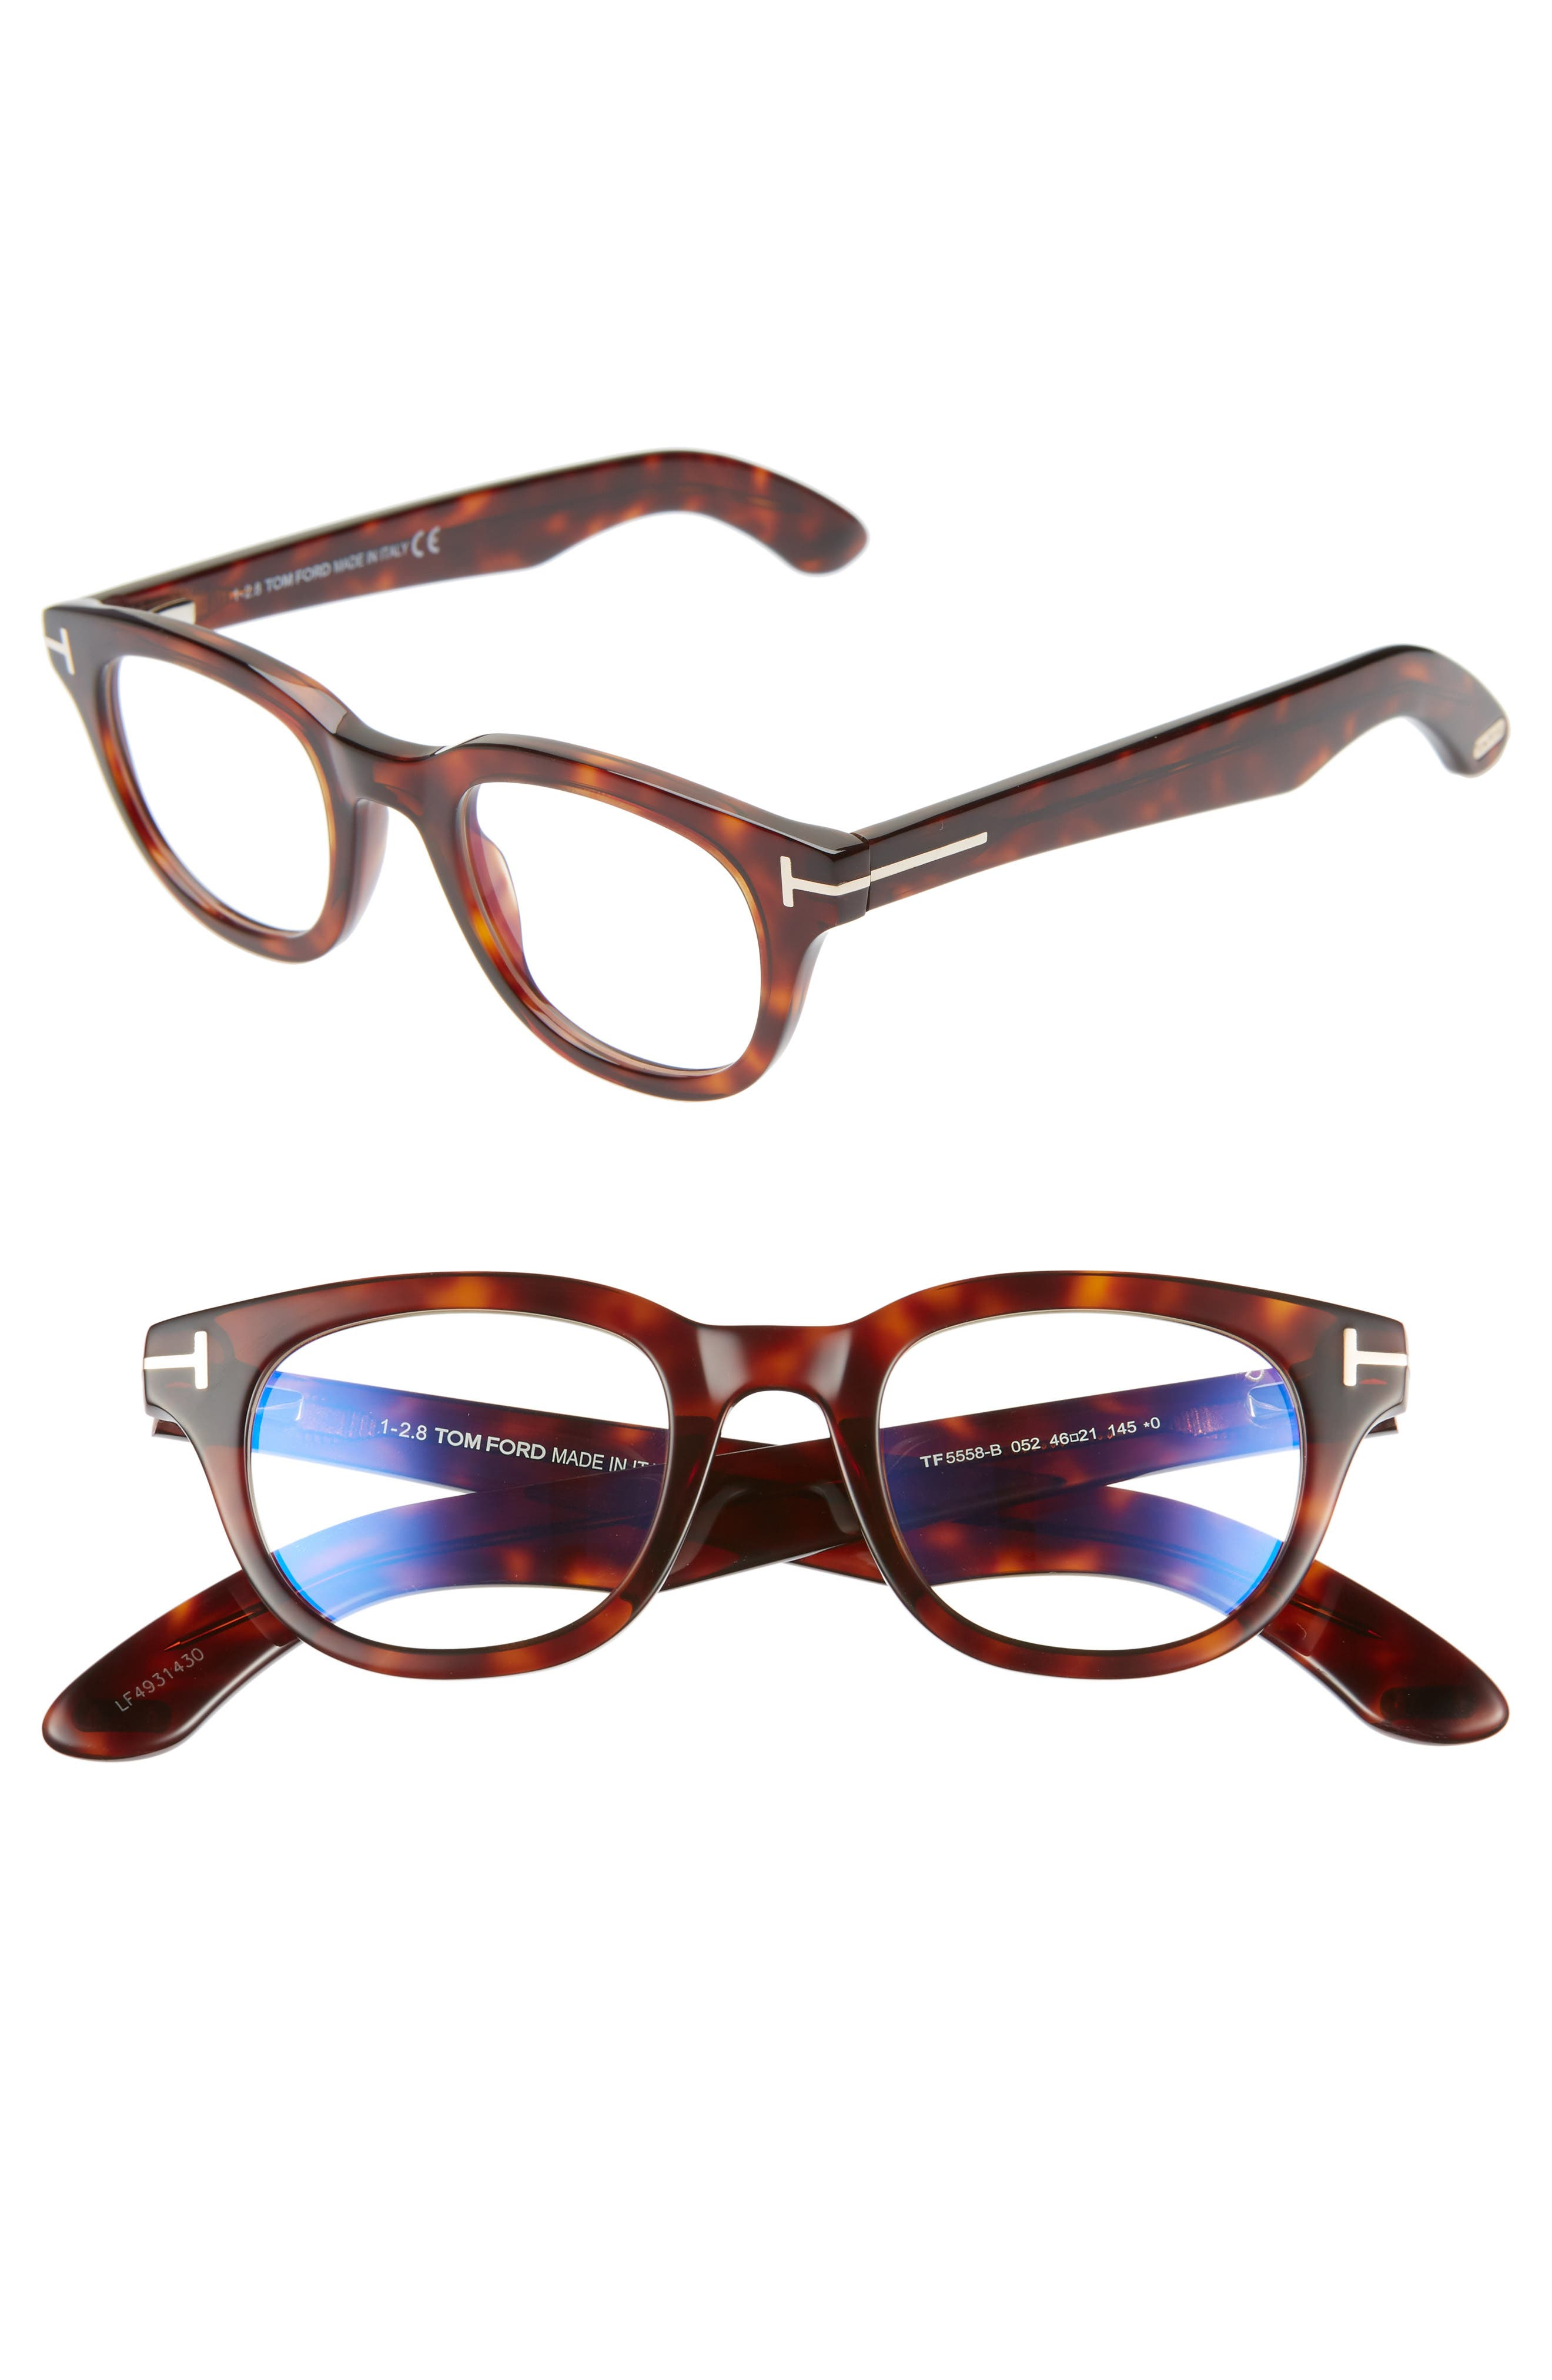 46mm Blue Light Blocking Glasses,                             Main thumbnail 1, color,                             SHINY DARK HAVANA/ ROSE GOLD